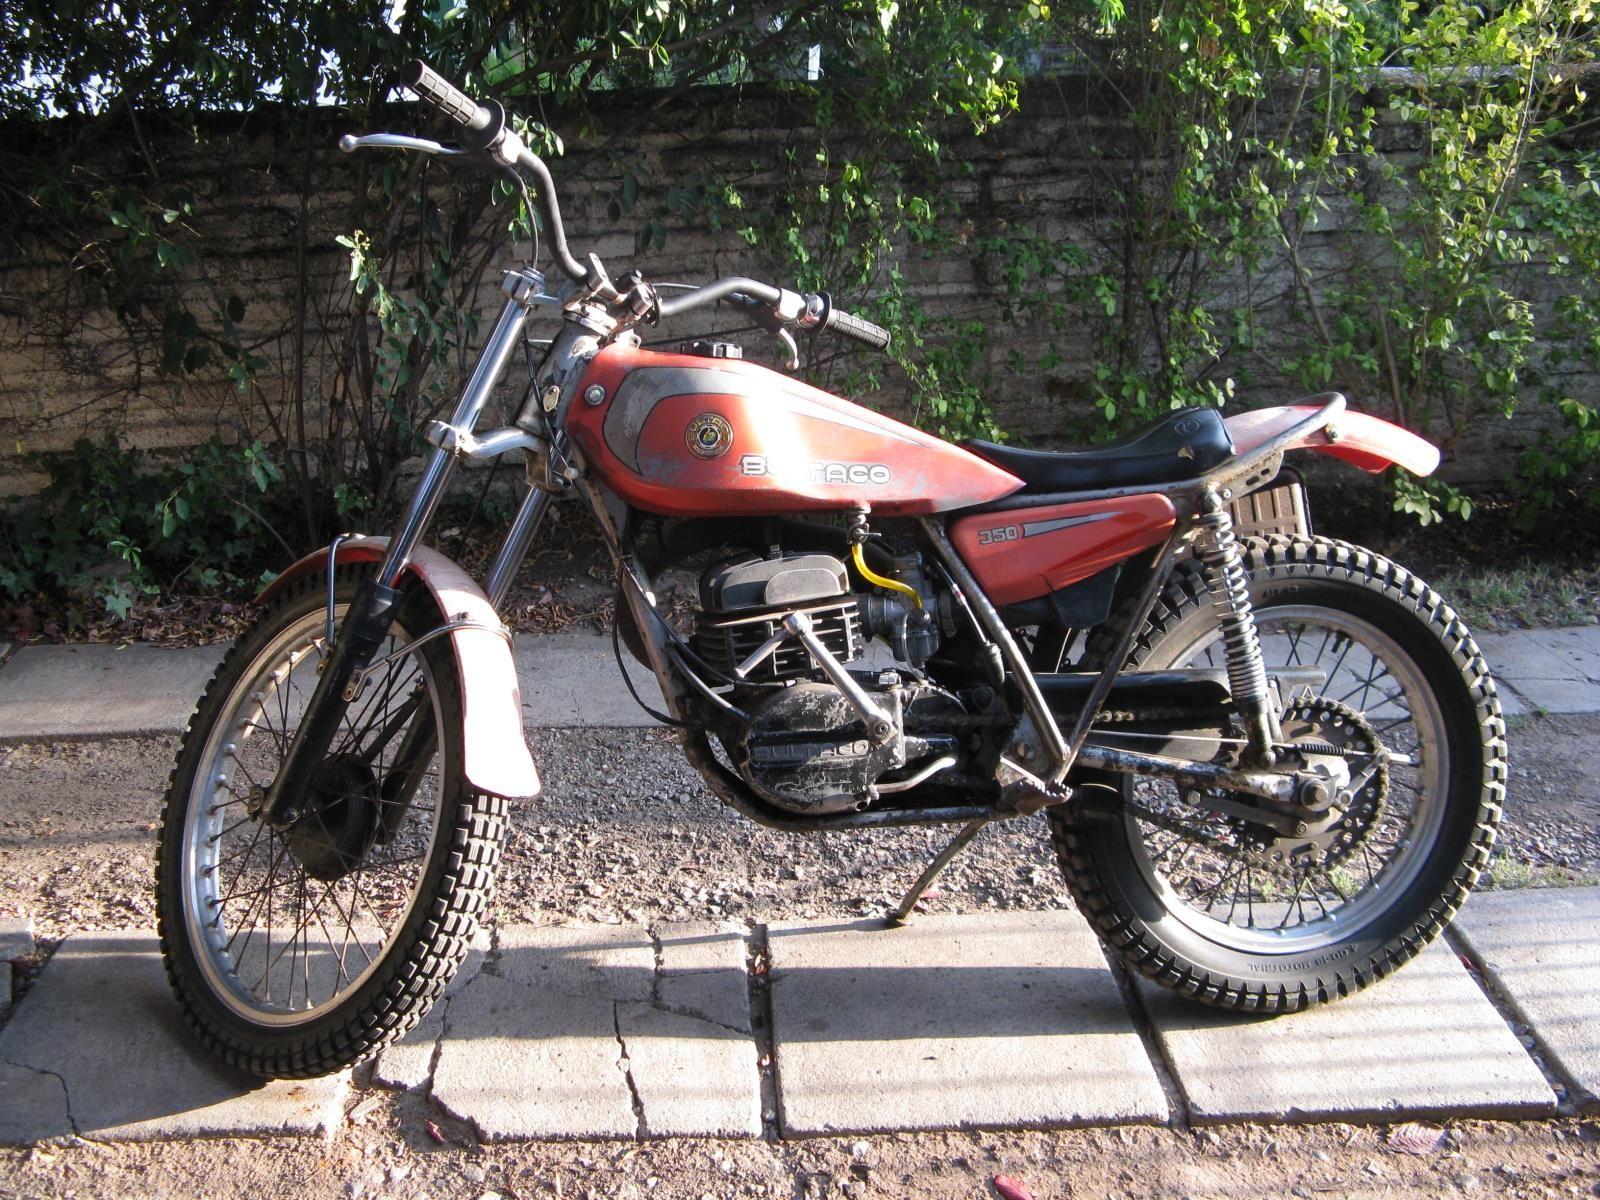 Bultaco Sherpa T-350 Mod  199 | Bultaco Sherpa T-350 Mod  199